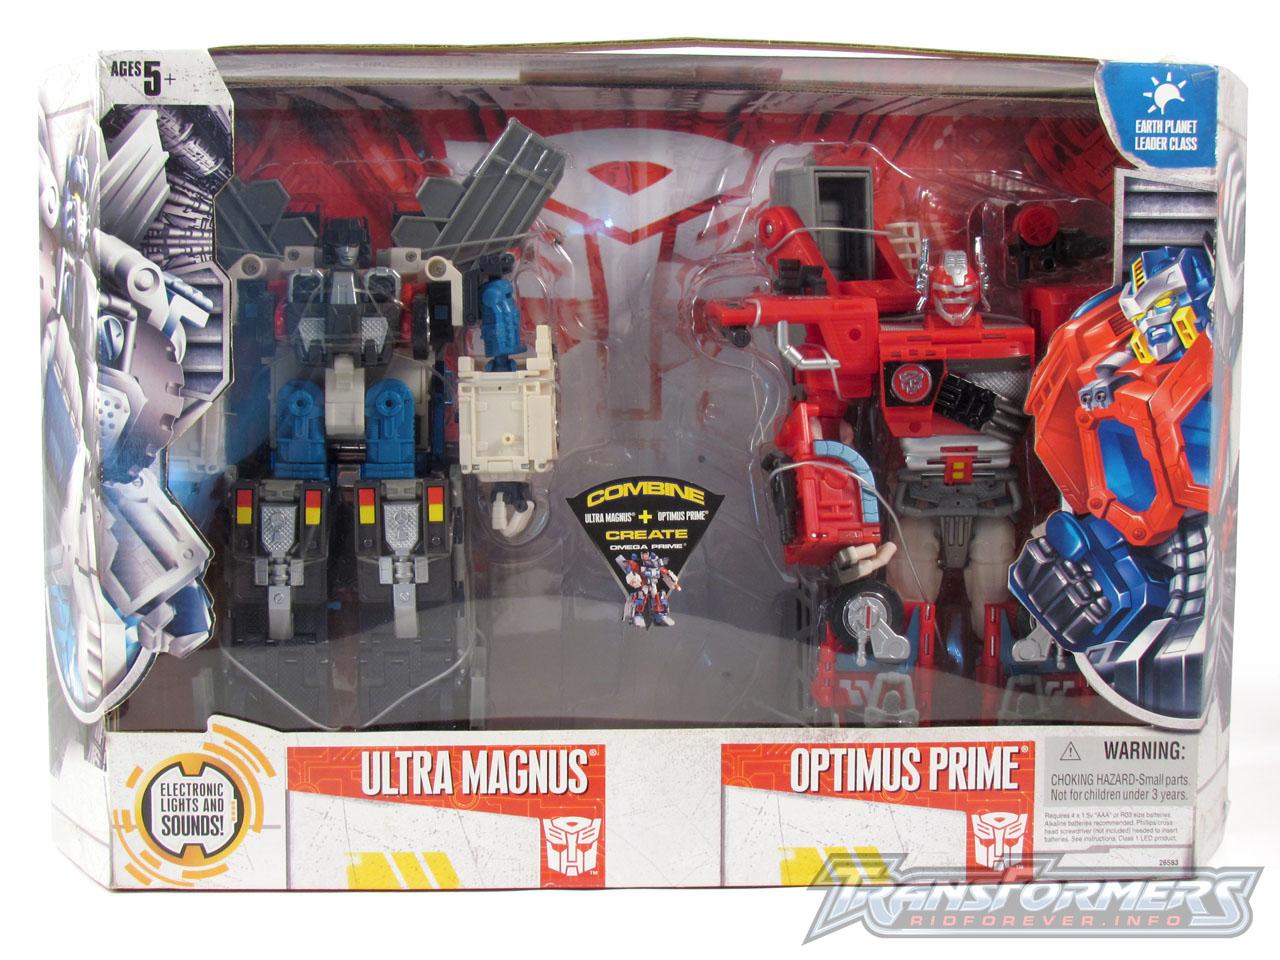 Cybertron Omega Prime 001